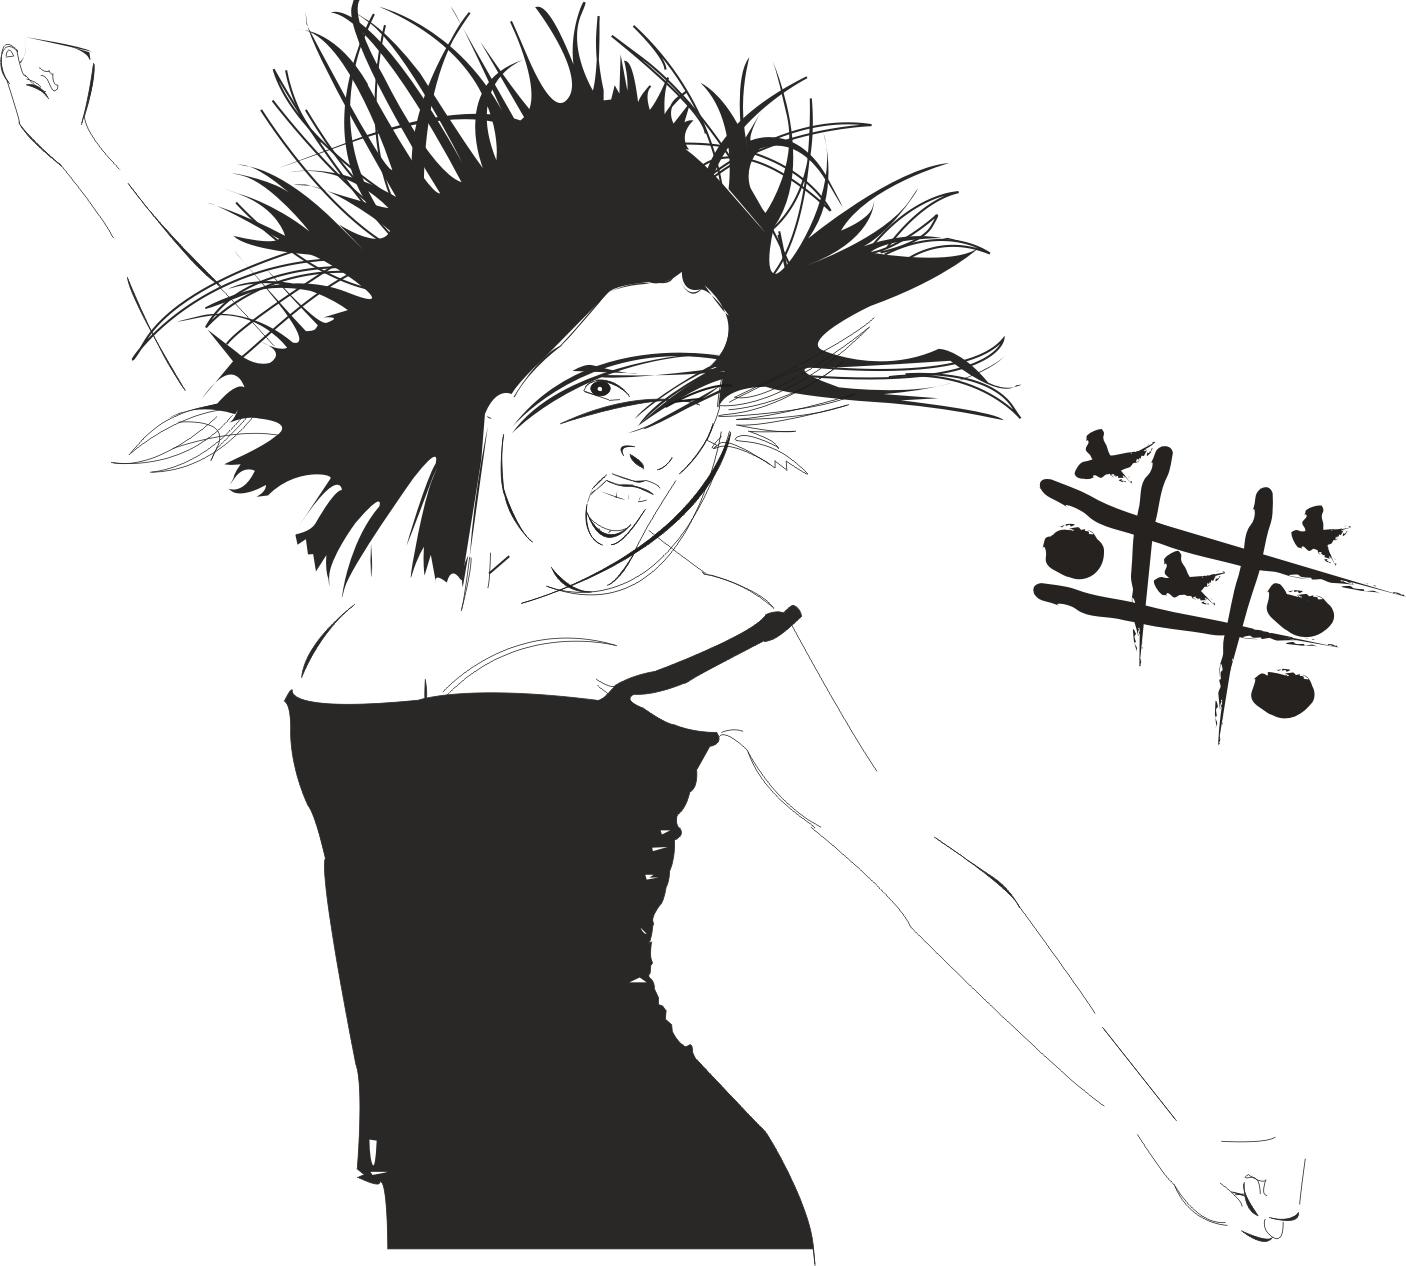 Female Clip Art Silhouette m1 Free CDR Vectors Art